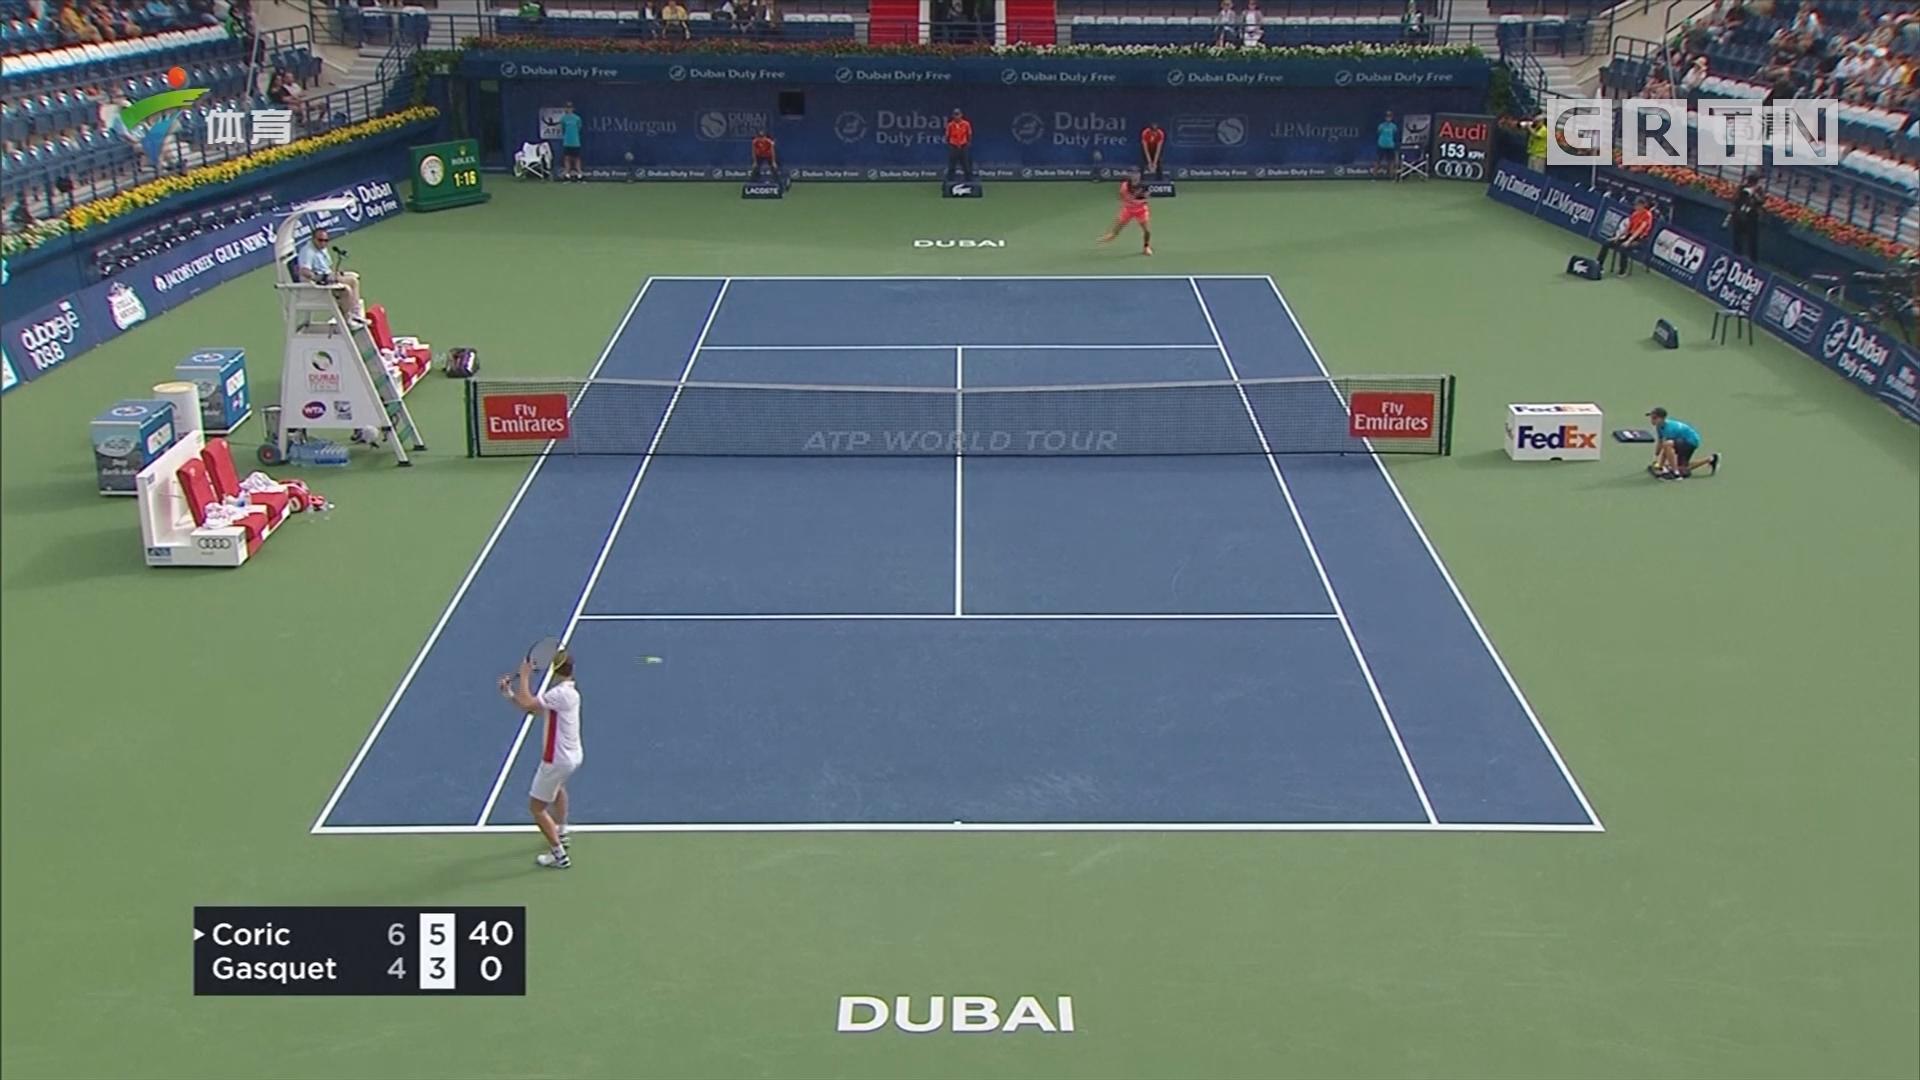 ATP迪拜赛 迪米特洛夫爆冷止步首轮